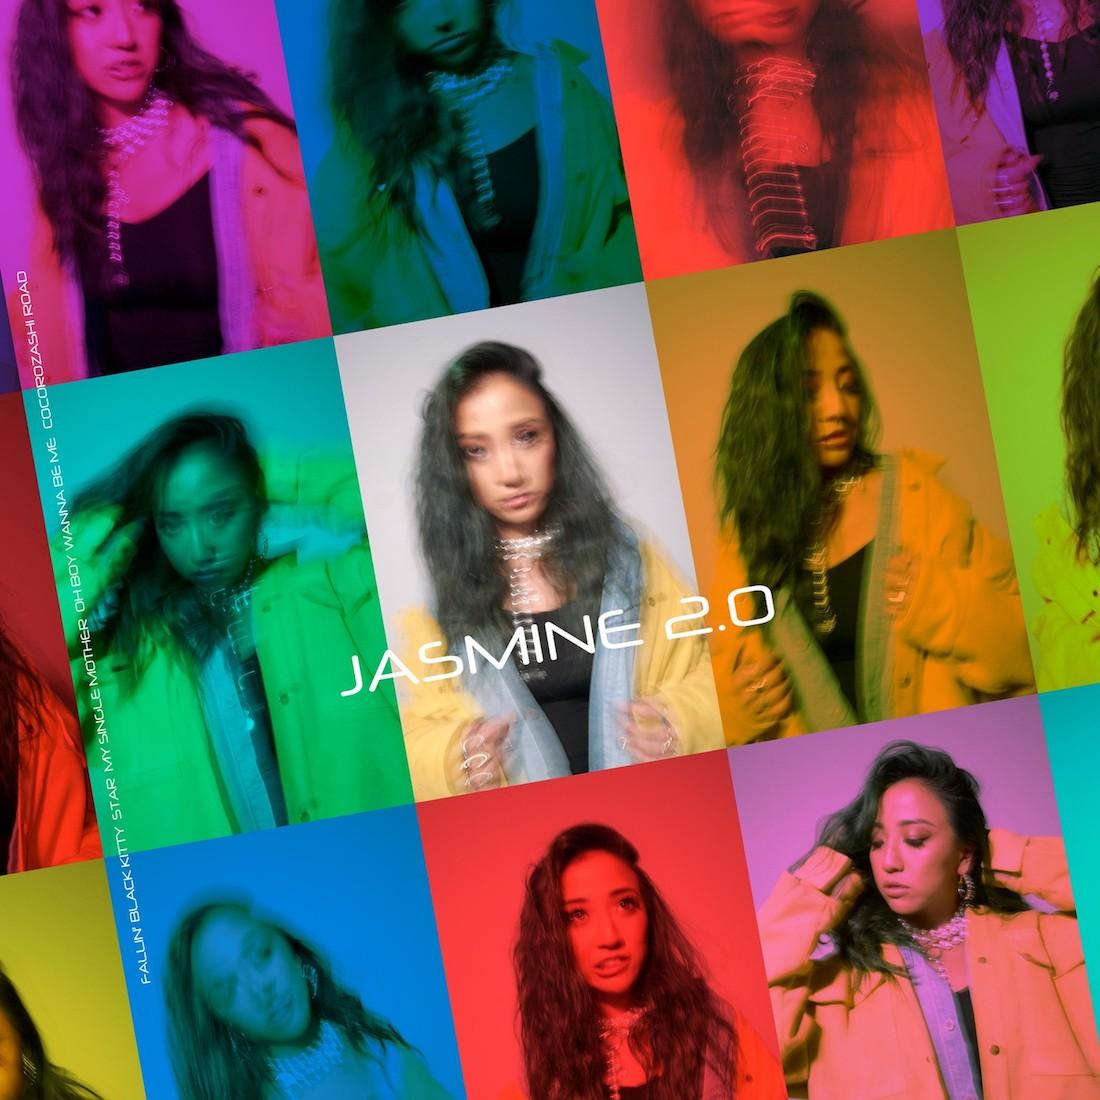 Jasmine 2.0